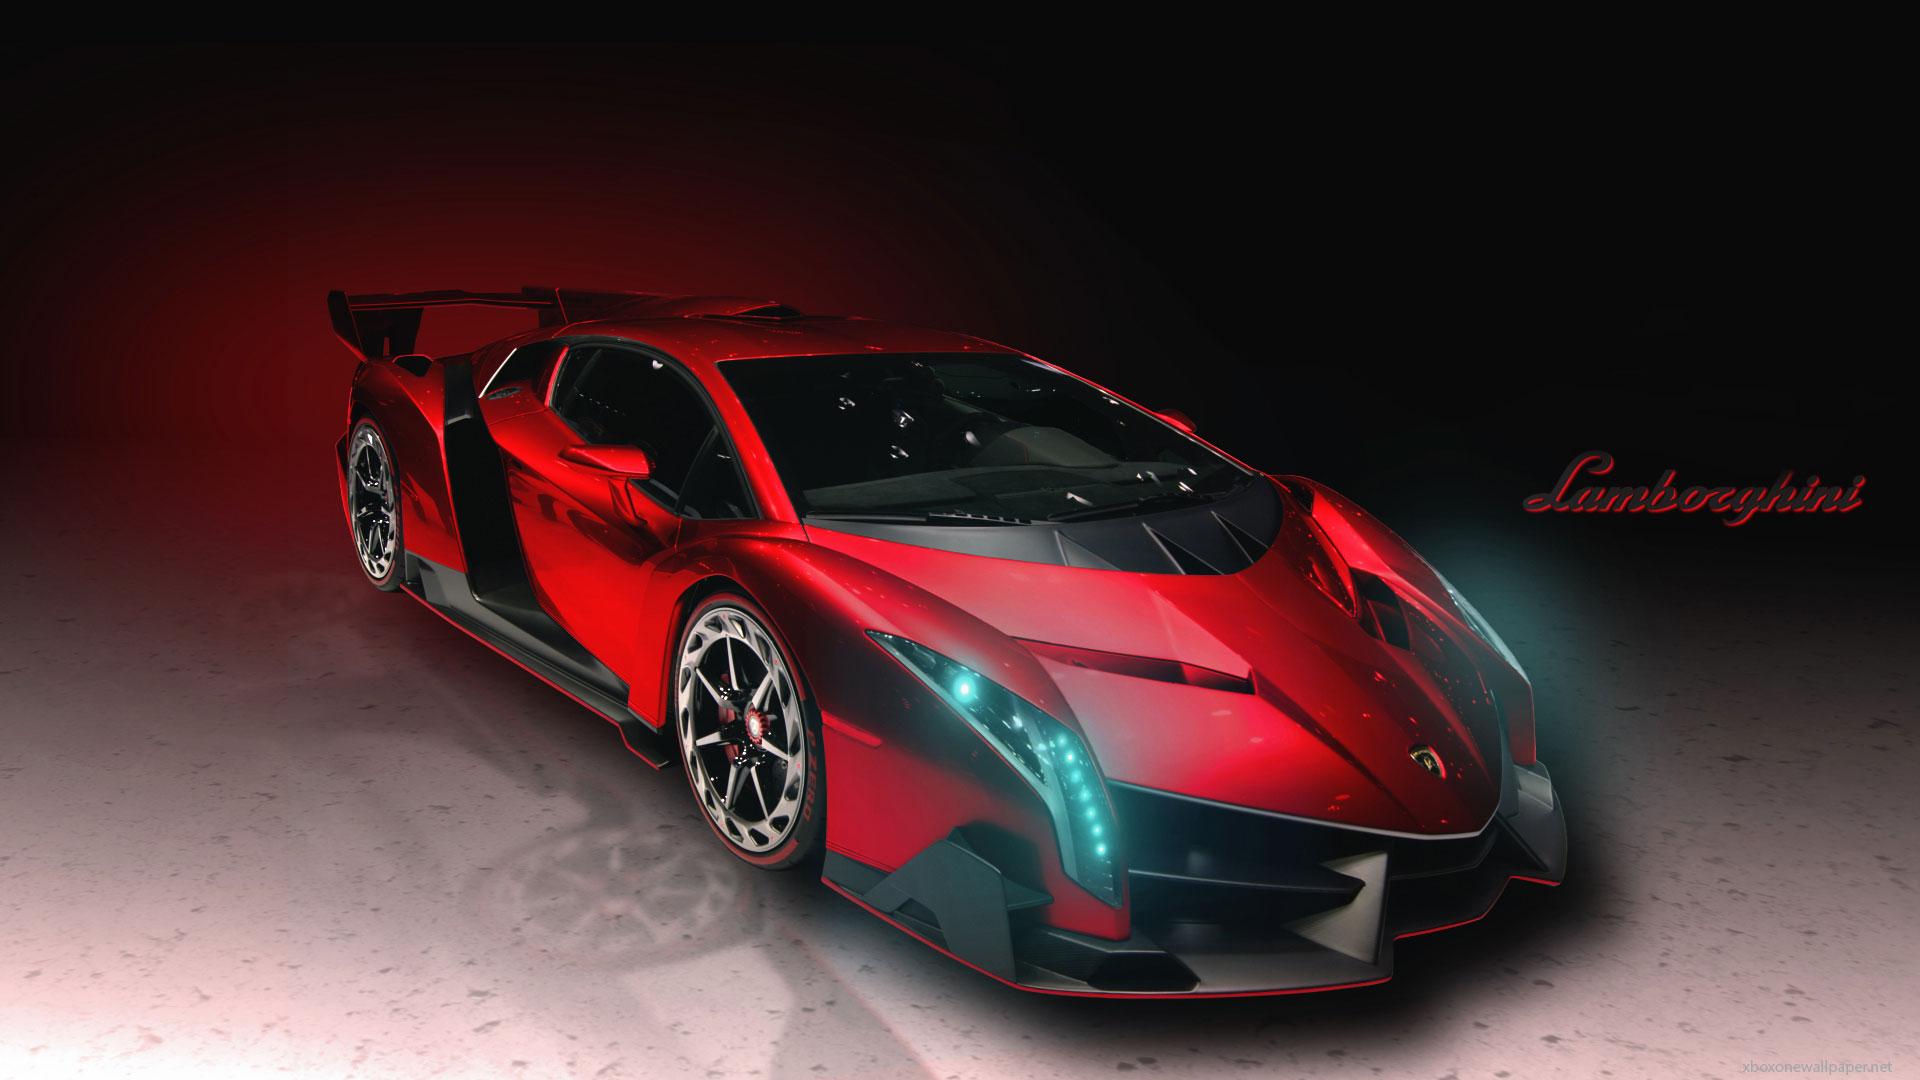 Lamborghini Veneno Wallpaper Photo HD Wallpaper 1080p 1920x1080